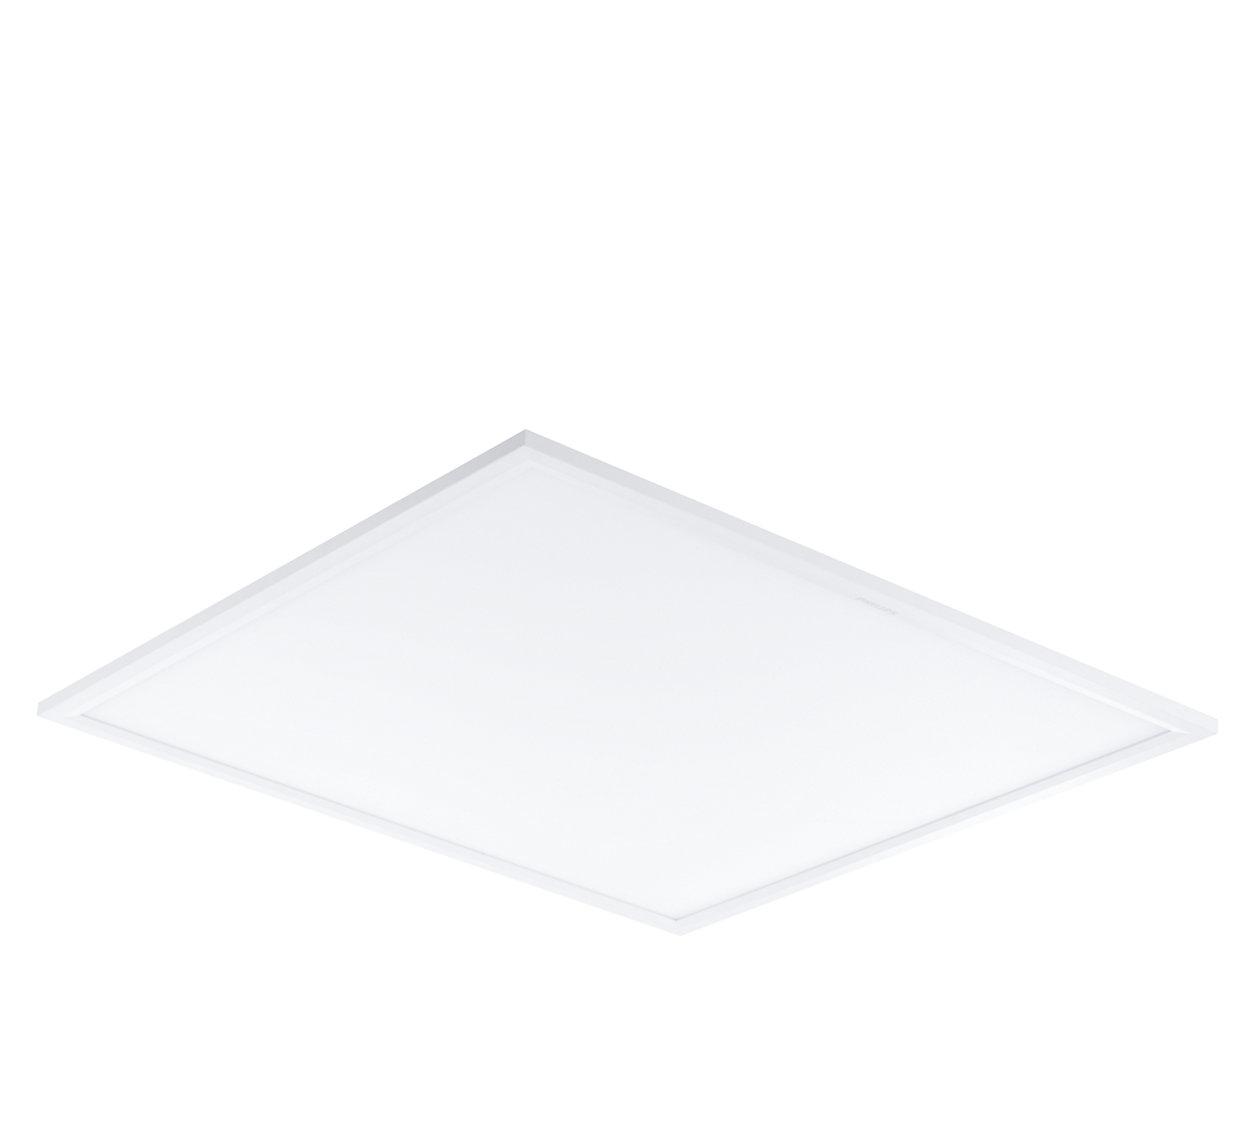 Panel Ledinaire − jednoducho skvelé LED svietidlo